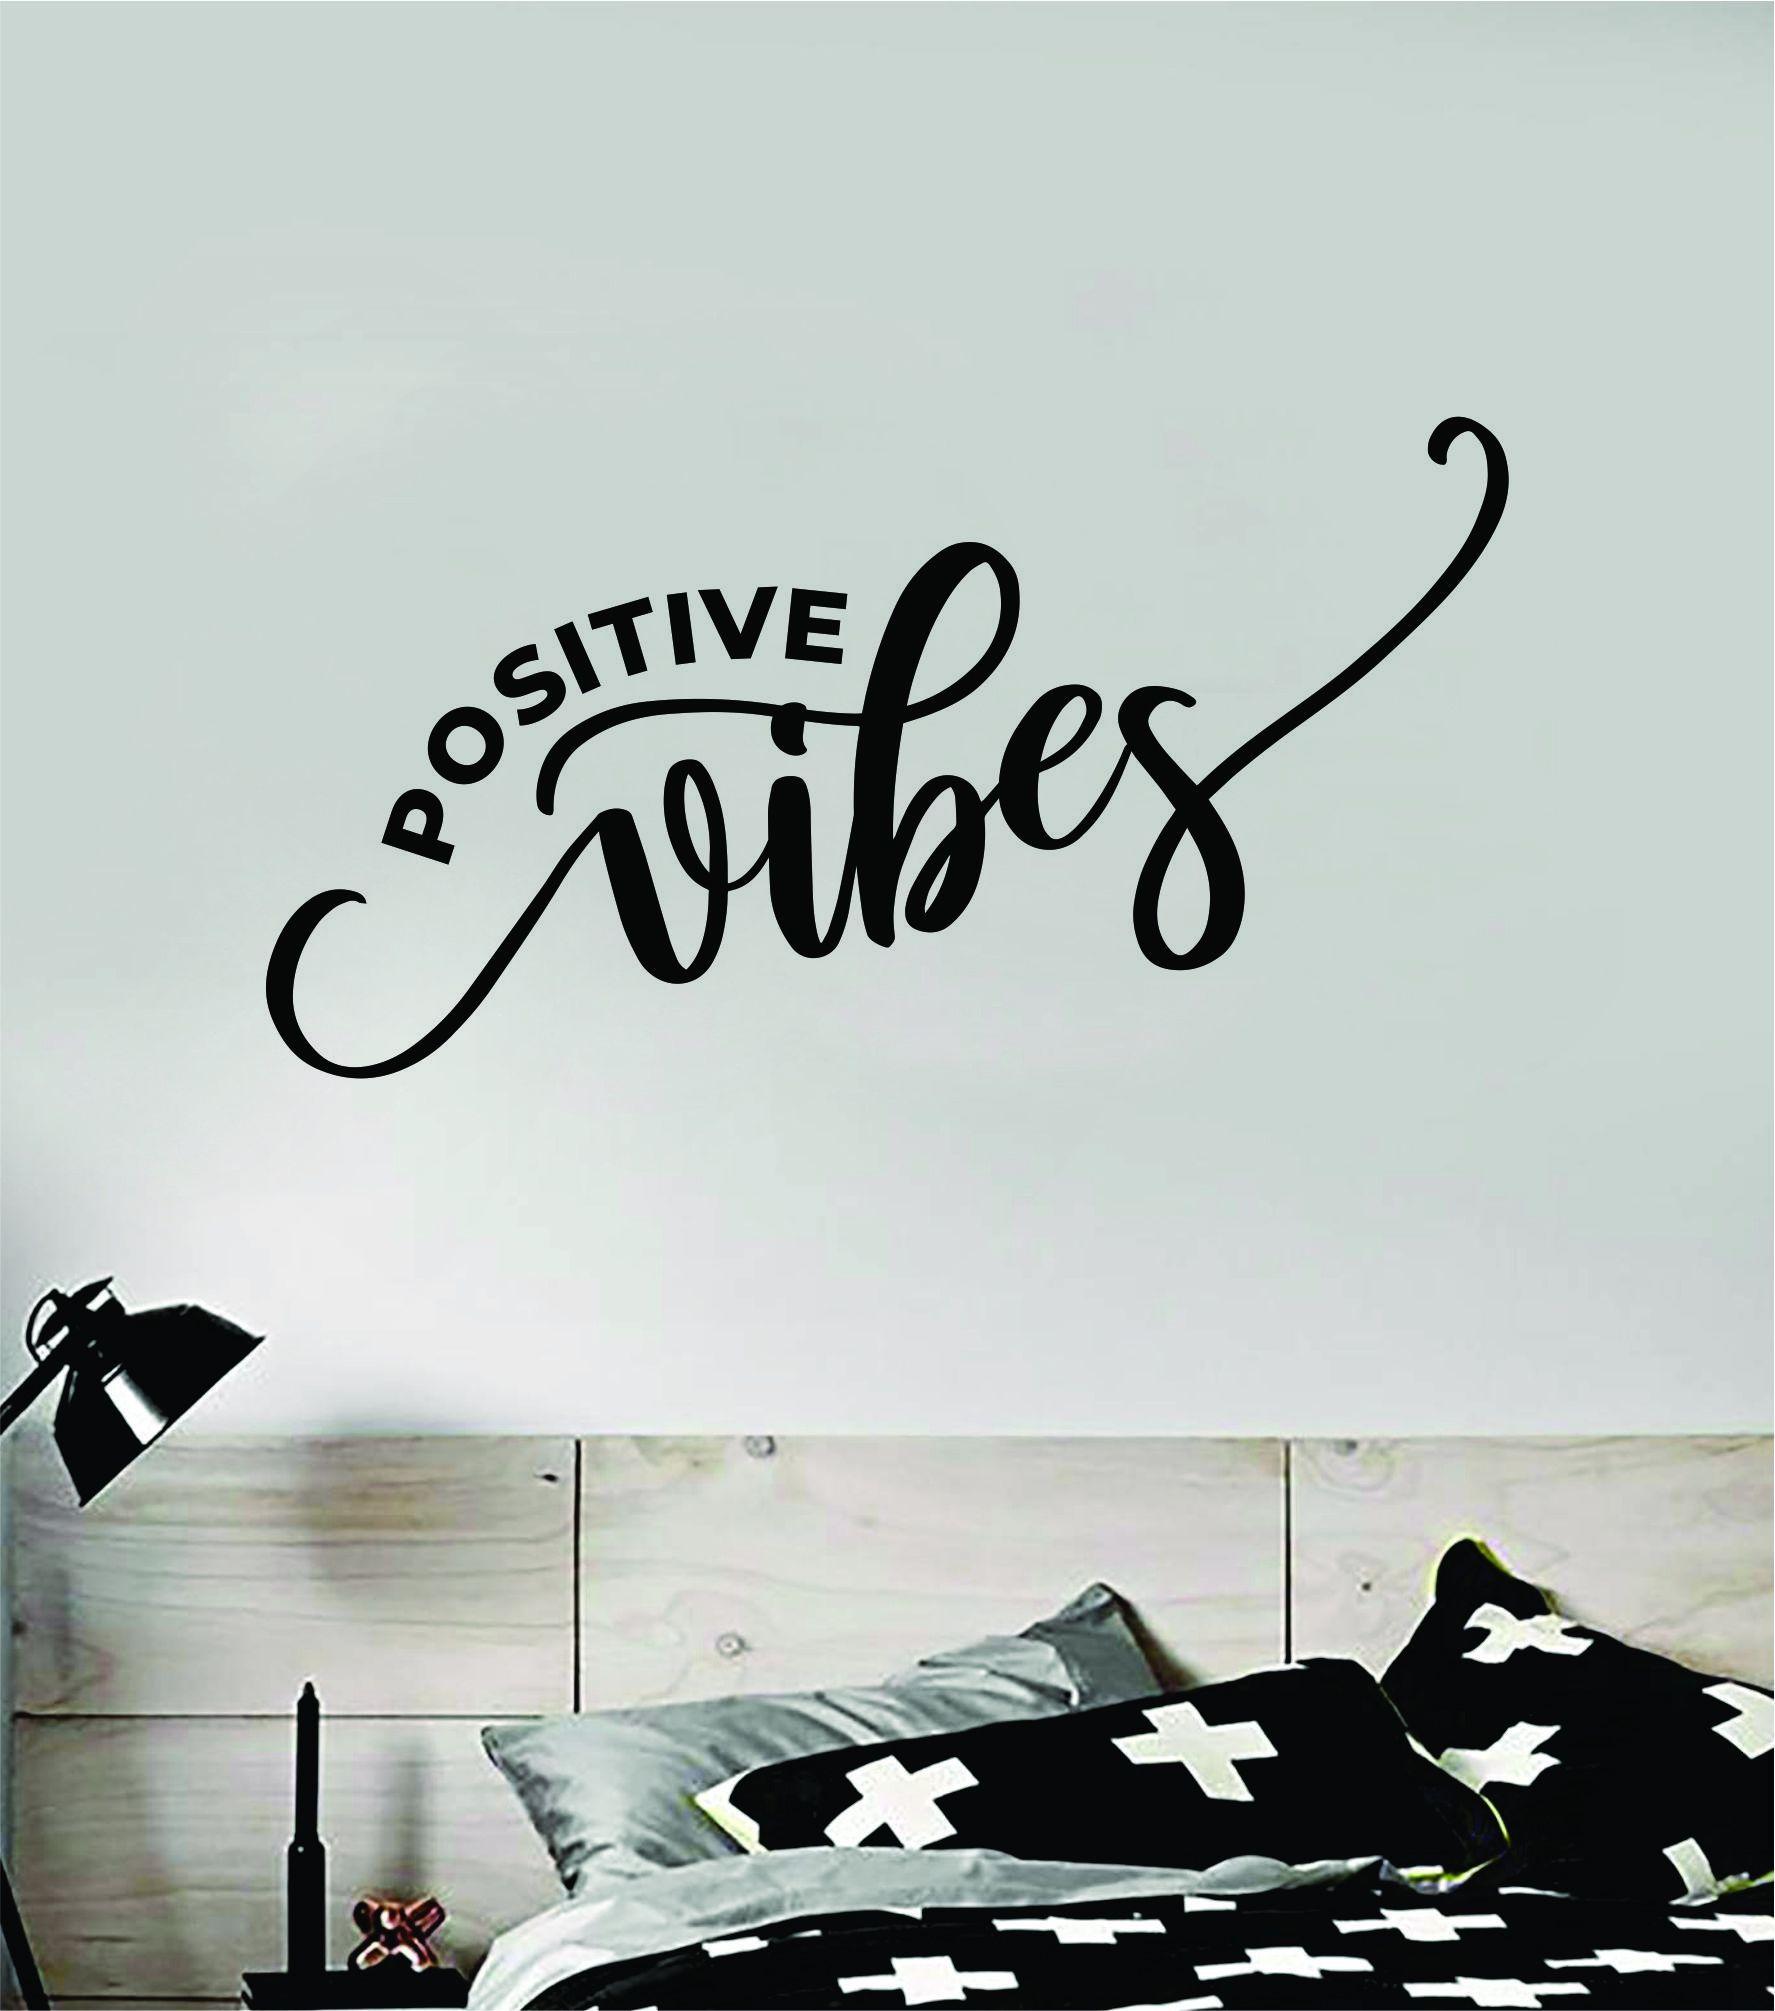 Positive Vibes Wall Decal Sticker Vinyl Art Bedroom Room Home Decor Inspirational Motivational School Teen Baby Nursery Kids Happy Smile - brown